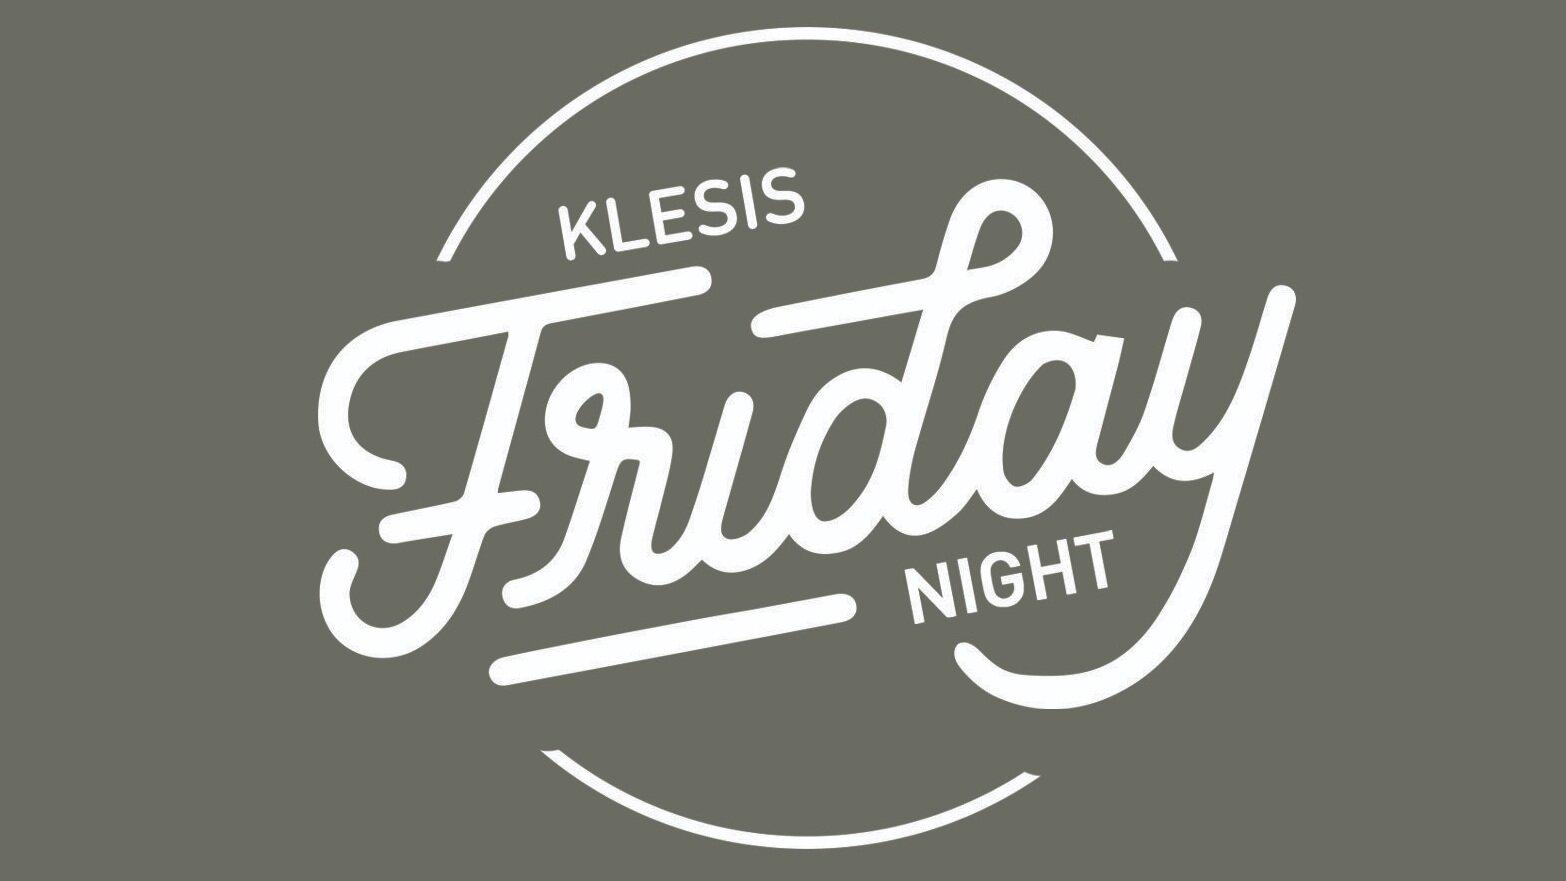 klesis_friday_night_the_friday_night